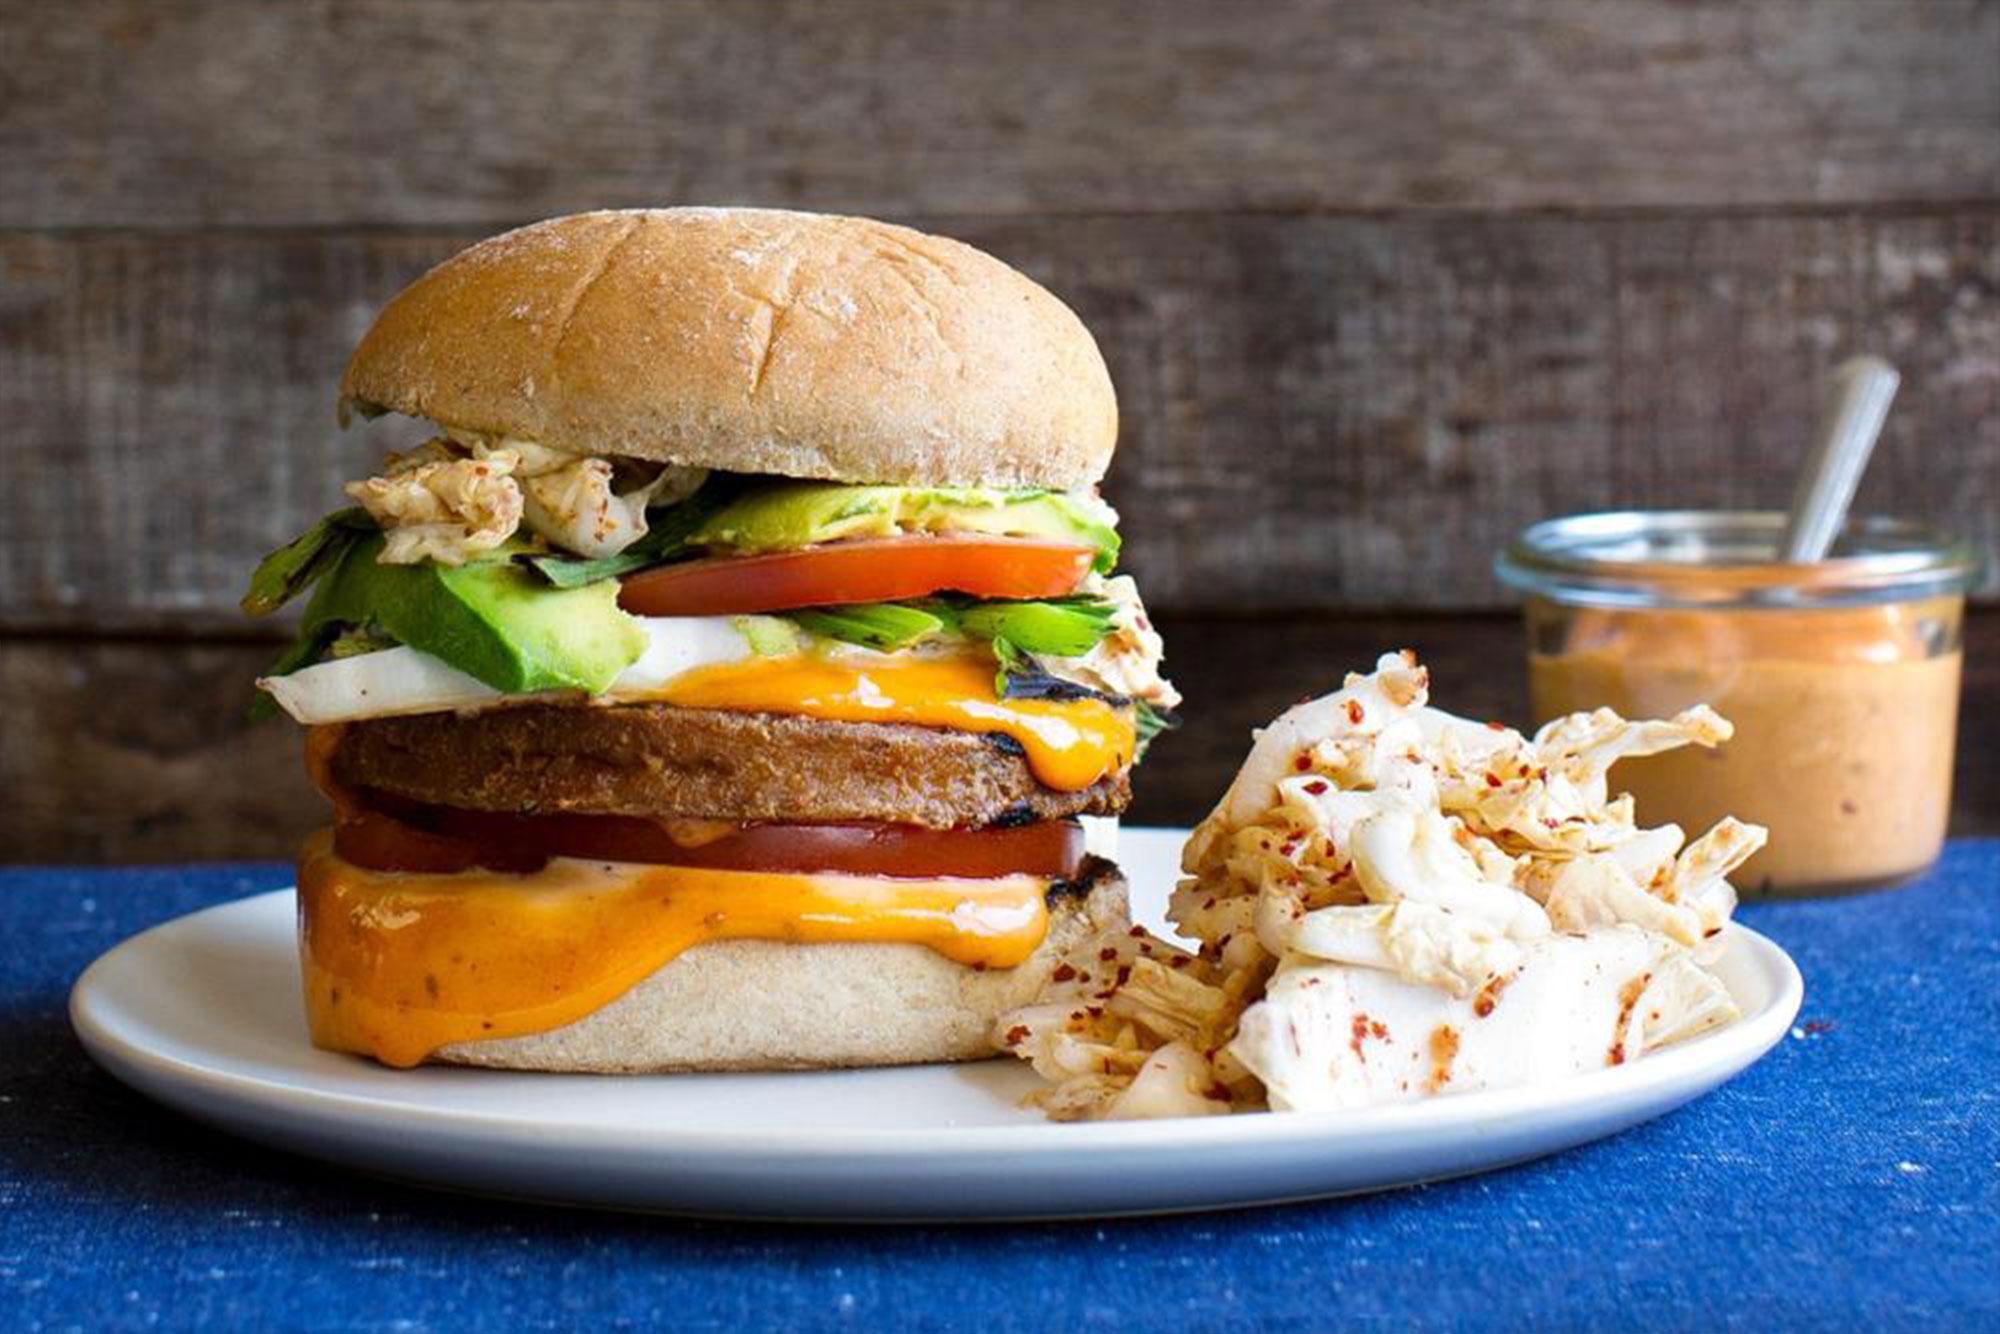 HodoFoods-Recipe-Chef-JustineKelly-SunBasket-Korean-style-tofu-burgers-with-kimchi-slaw.jpg